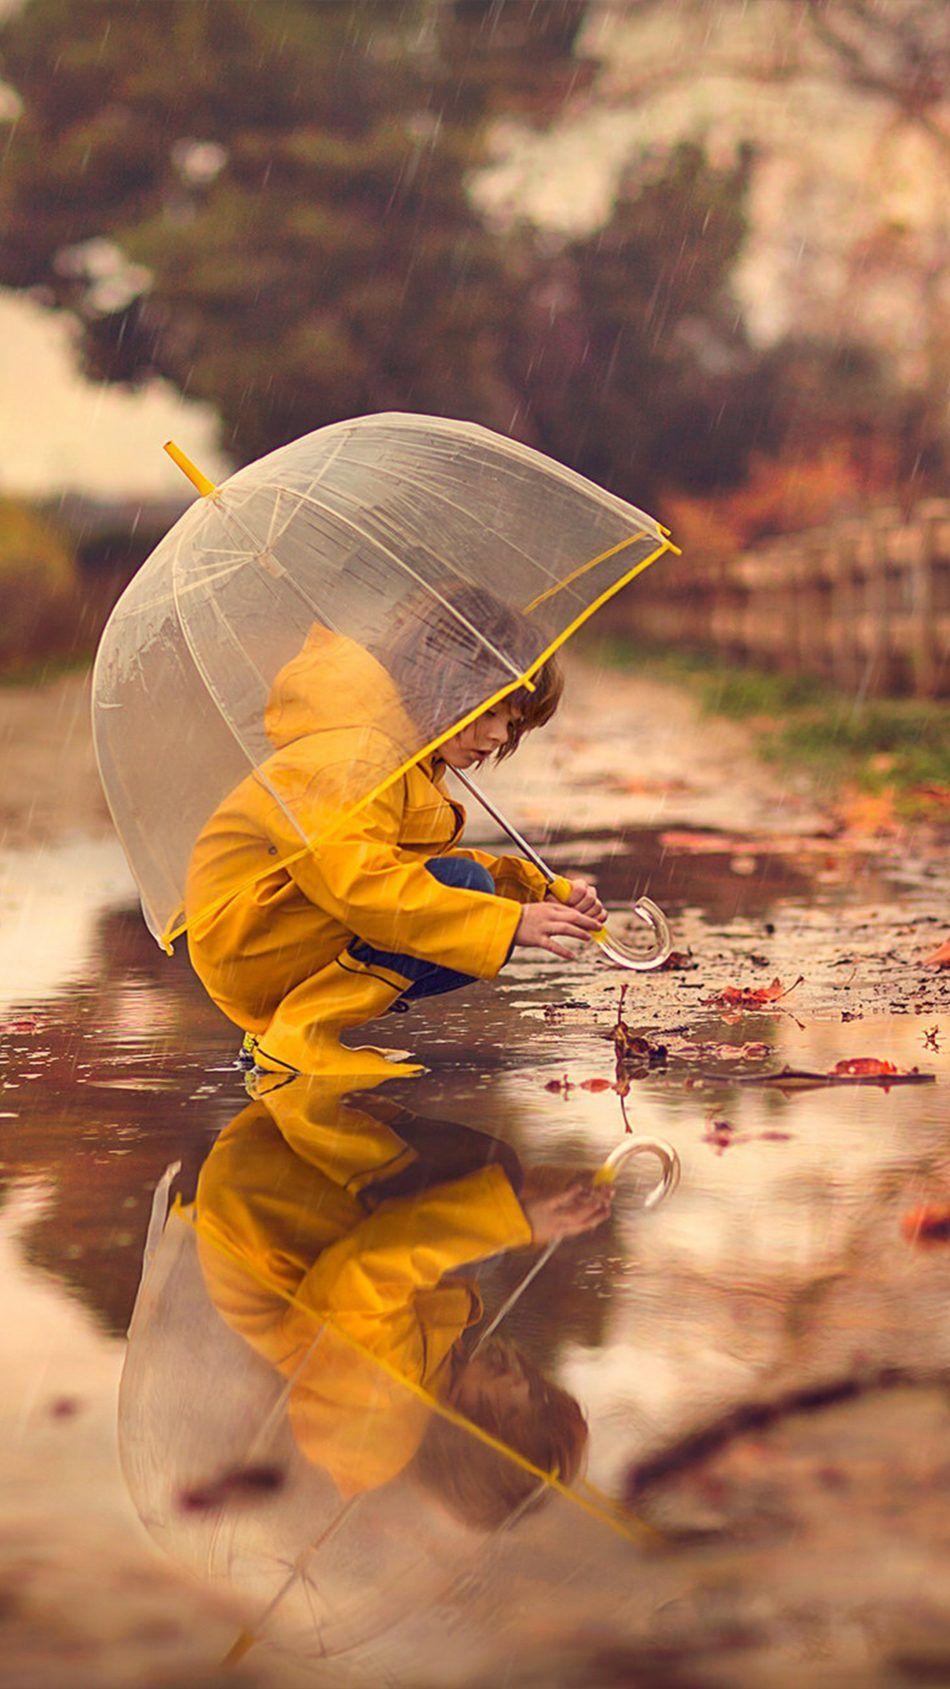 Kid Umbrella Rain Reflection 4k Ultra Hd Mobile Wallpaper Kids Umbrellas Umbrella Photography Umbrellas Photography